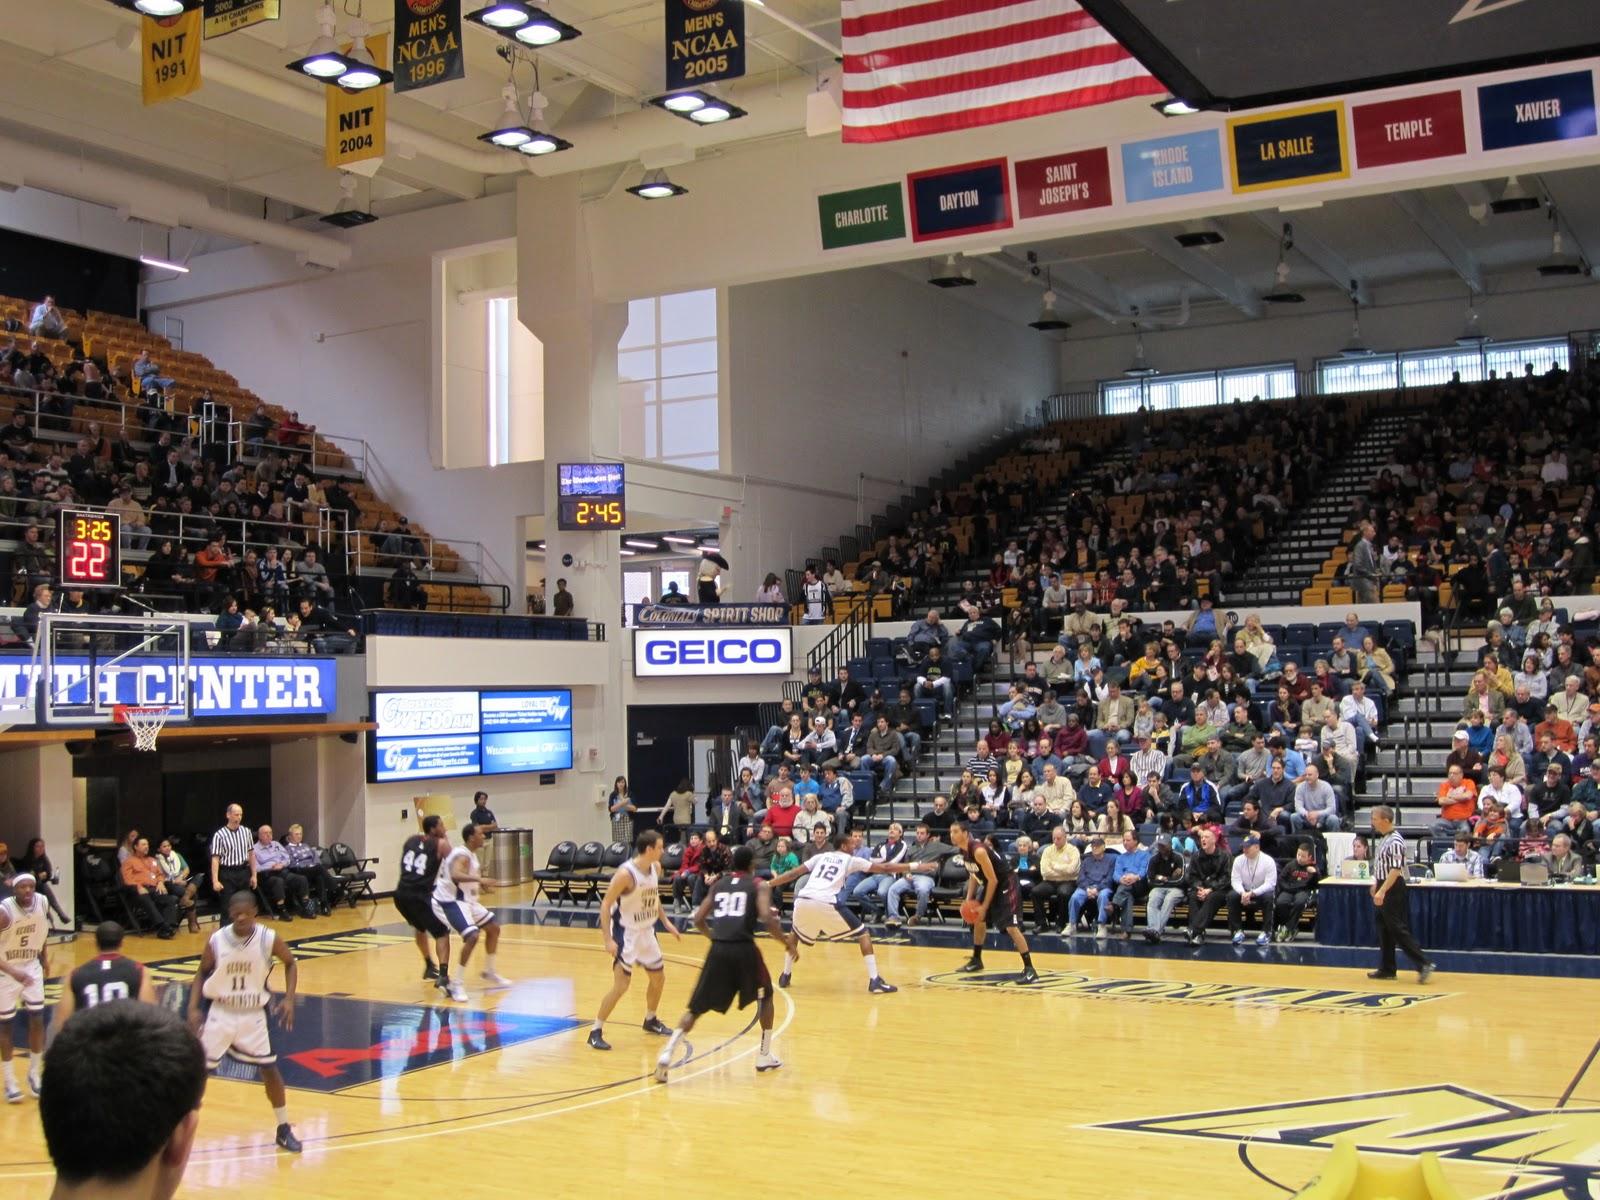 gw admissions student blog: gw men's basketball